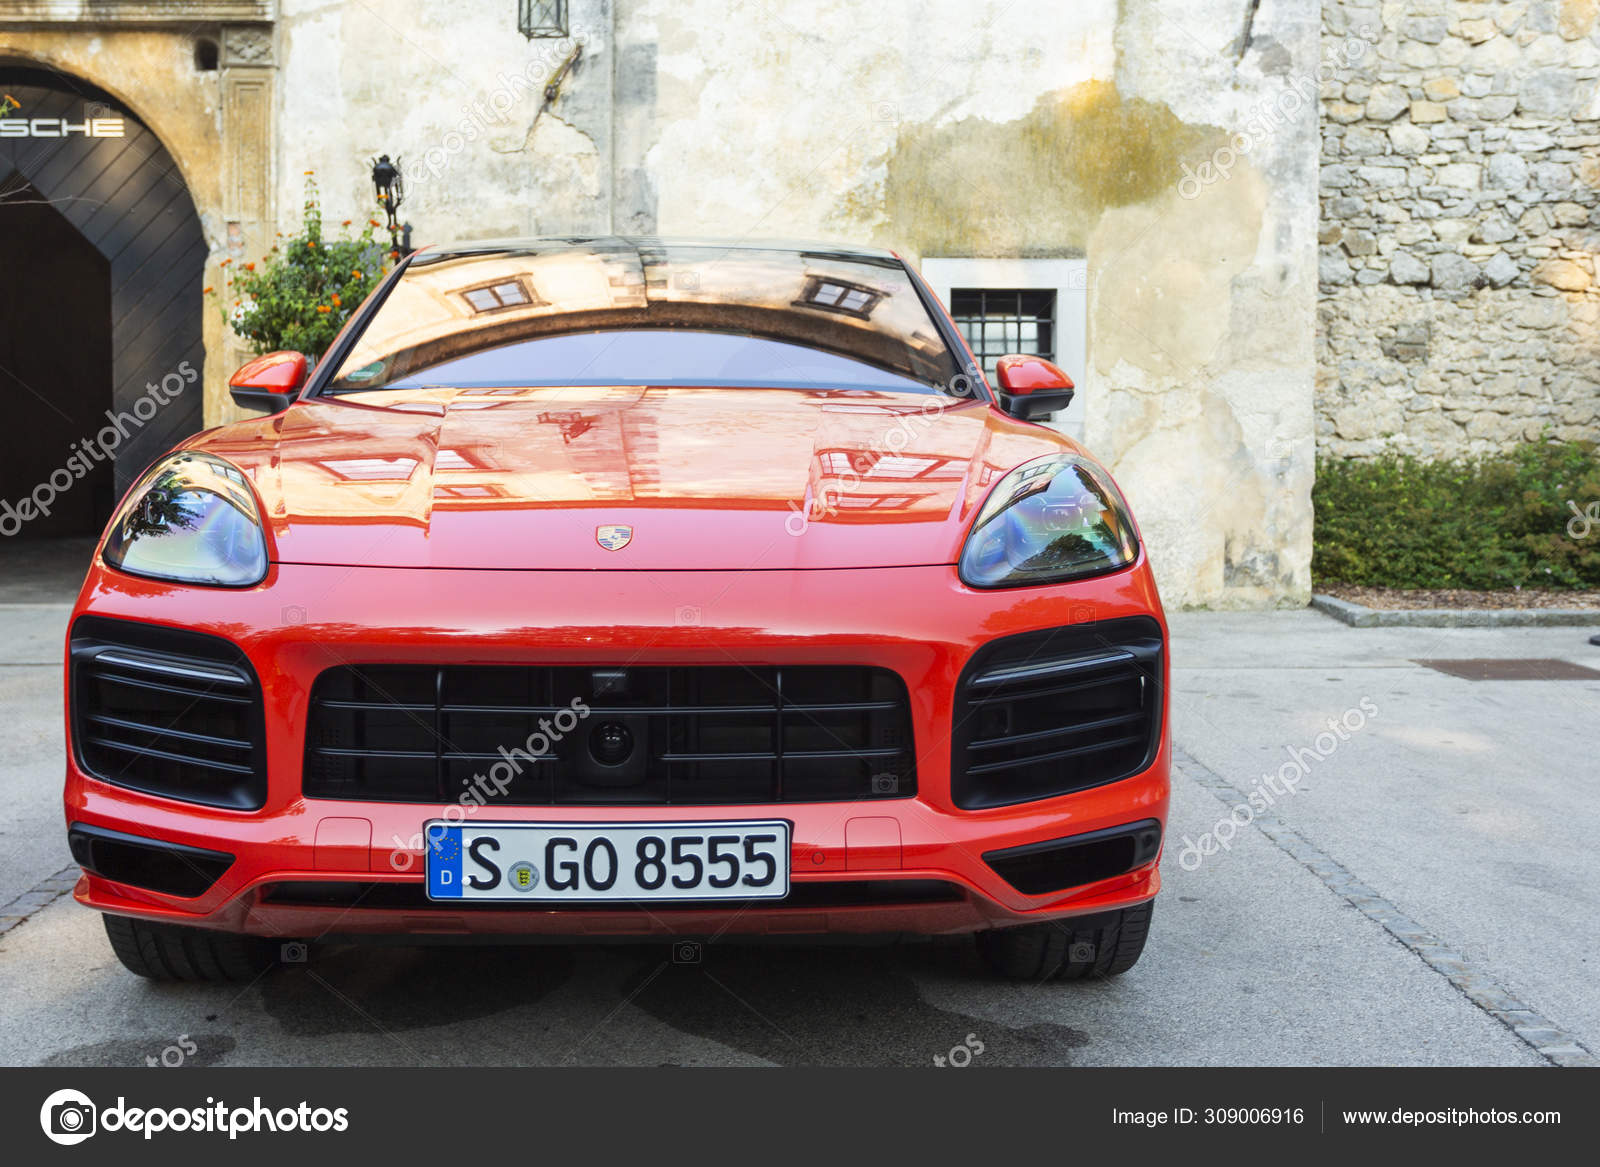 Red Porsche Cayenne Stock Photos Royalty Free Red Porsche Cayenne Images Depositphotos